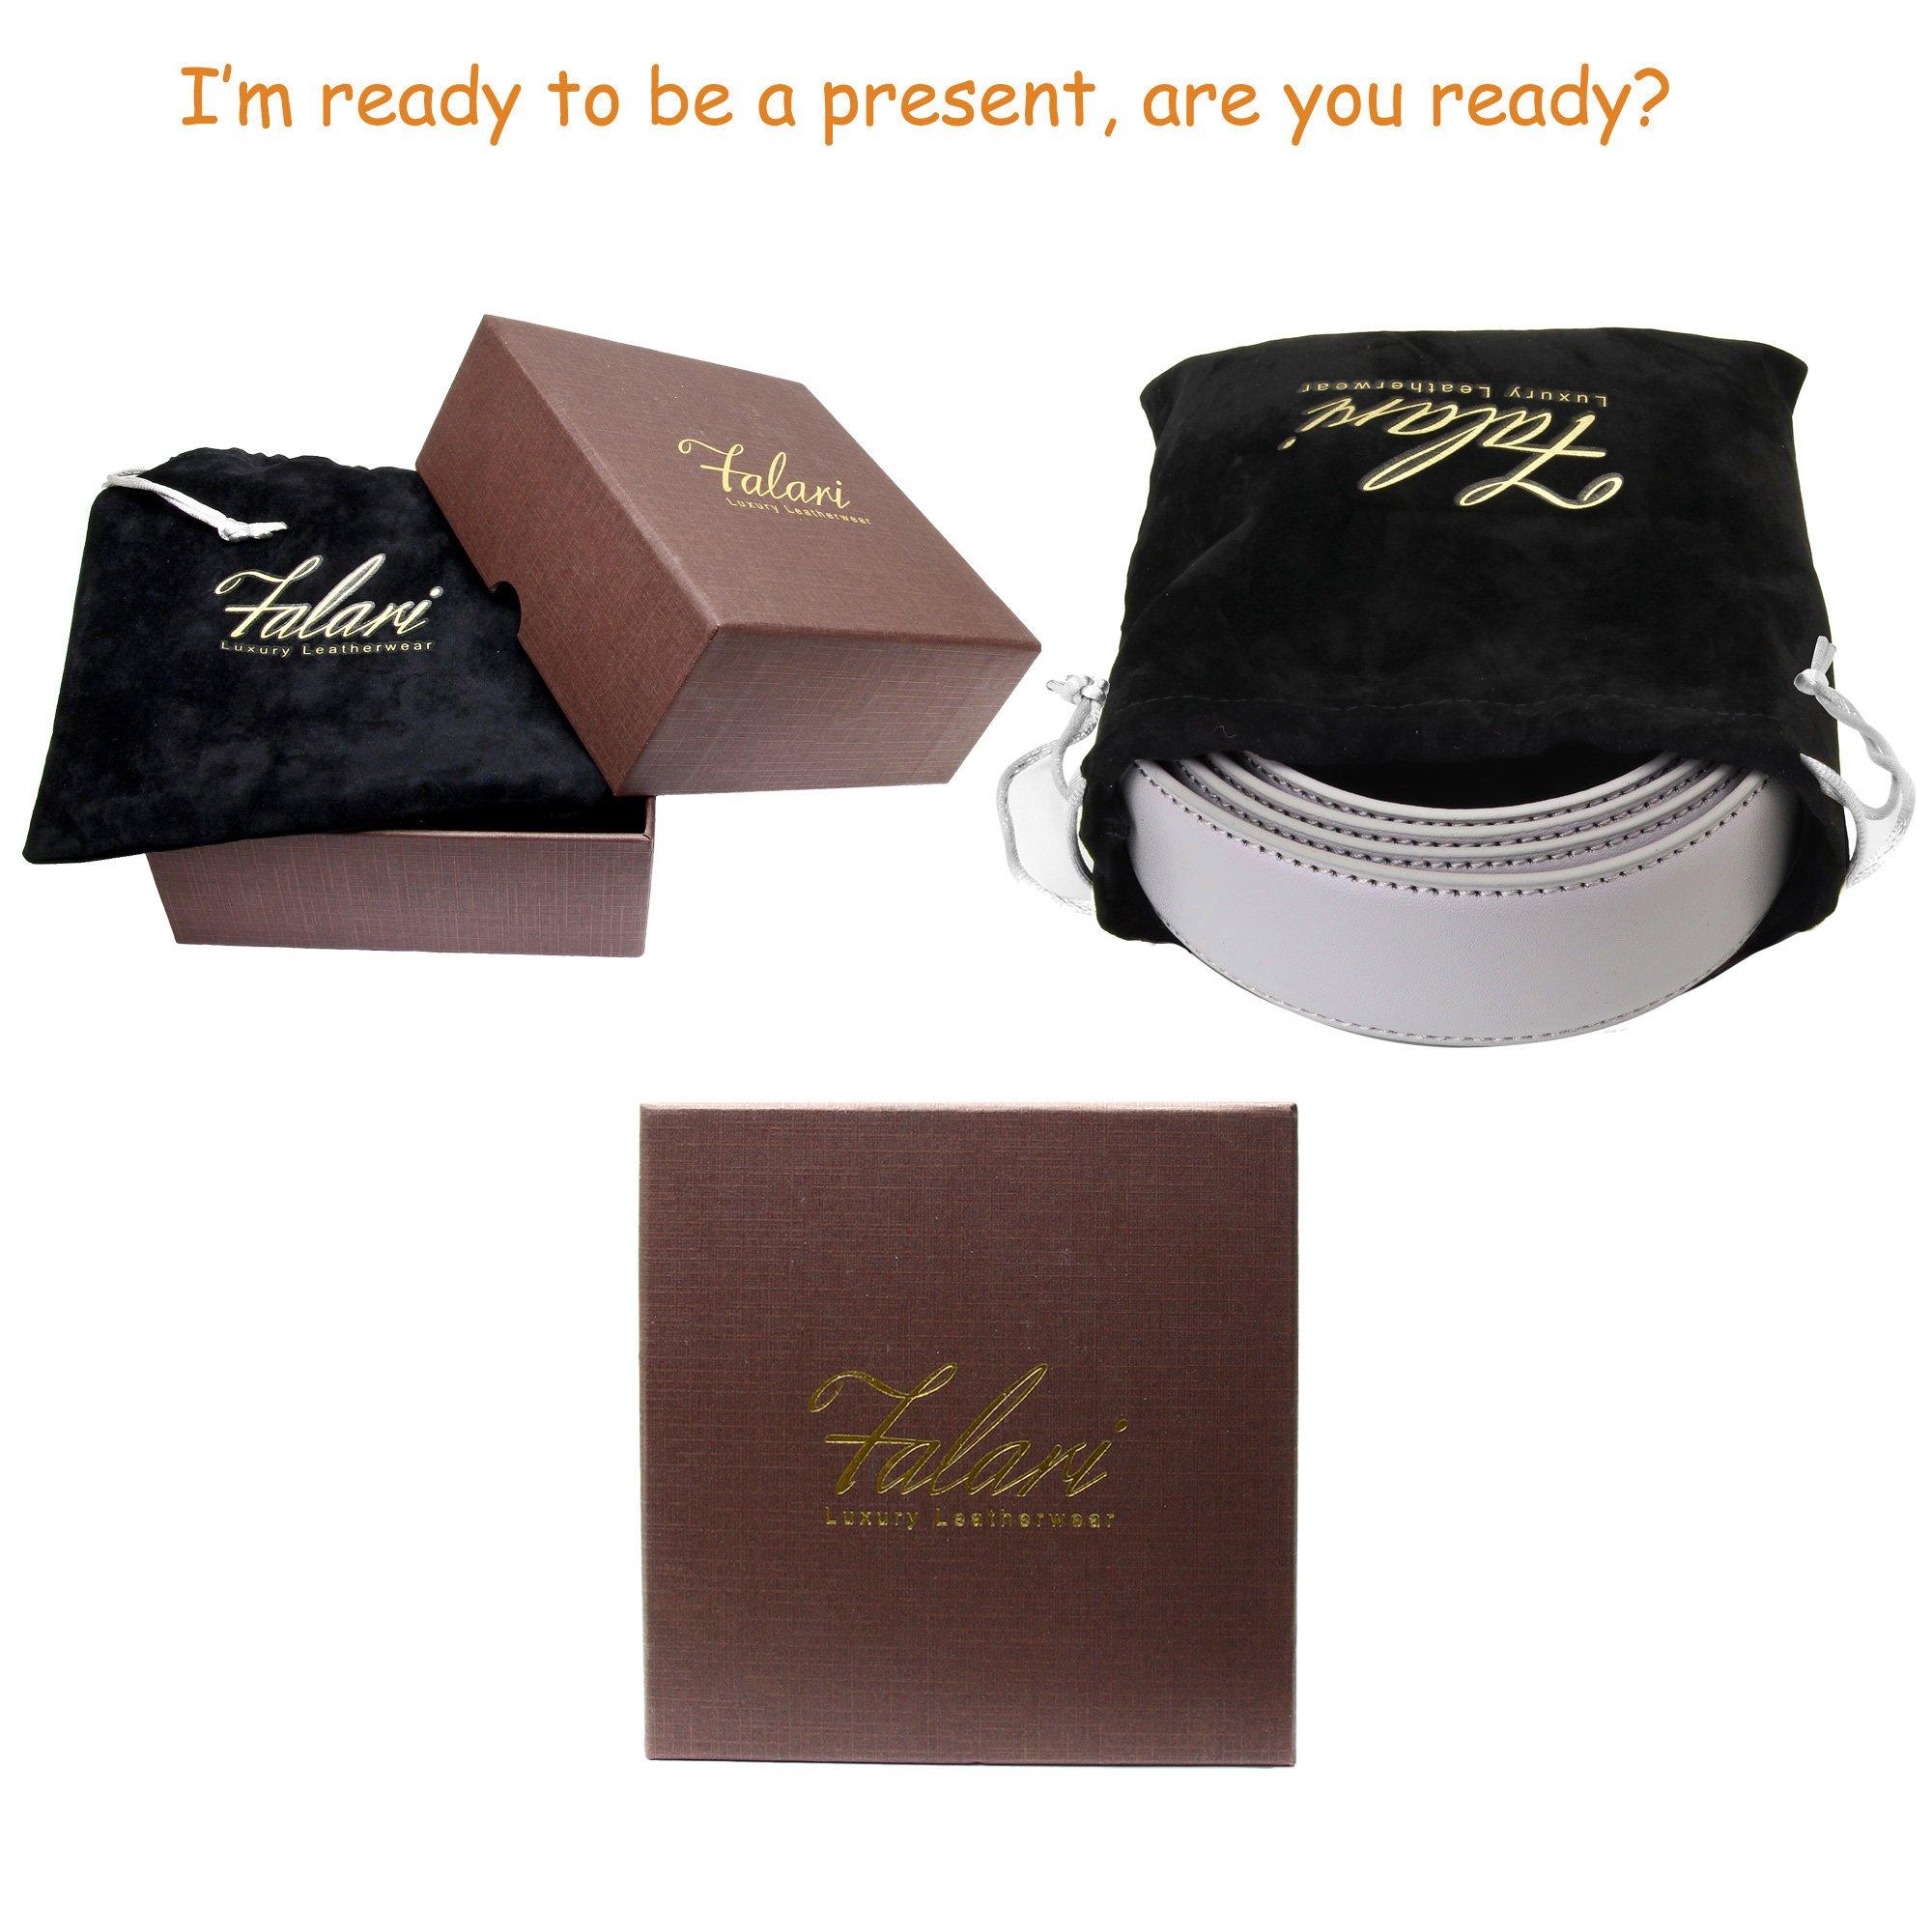 Falari Men's Leather Ratchet Belt Strap 8004-LGY-L40 by Falari (Image #6)